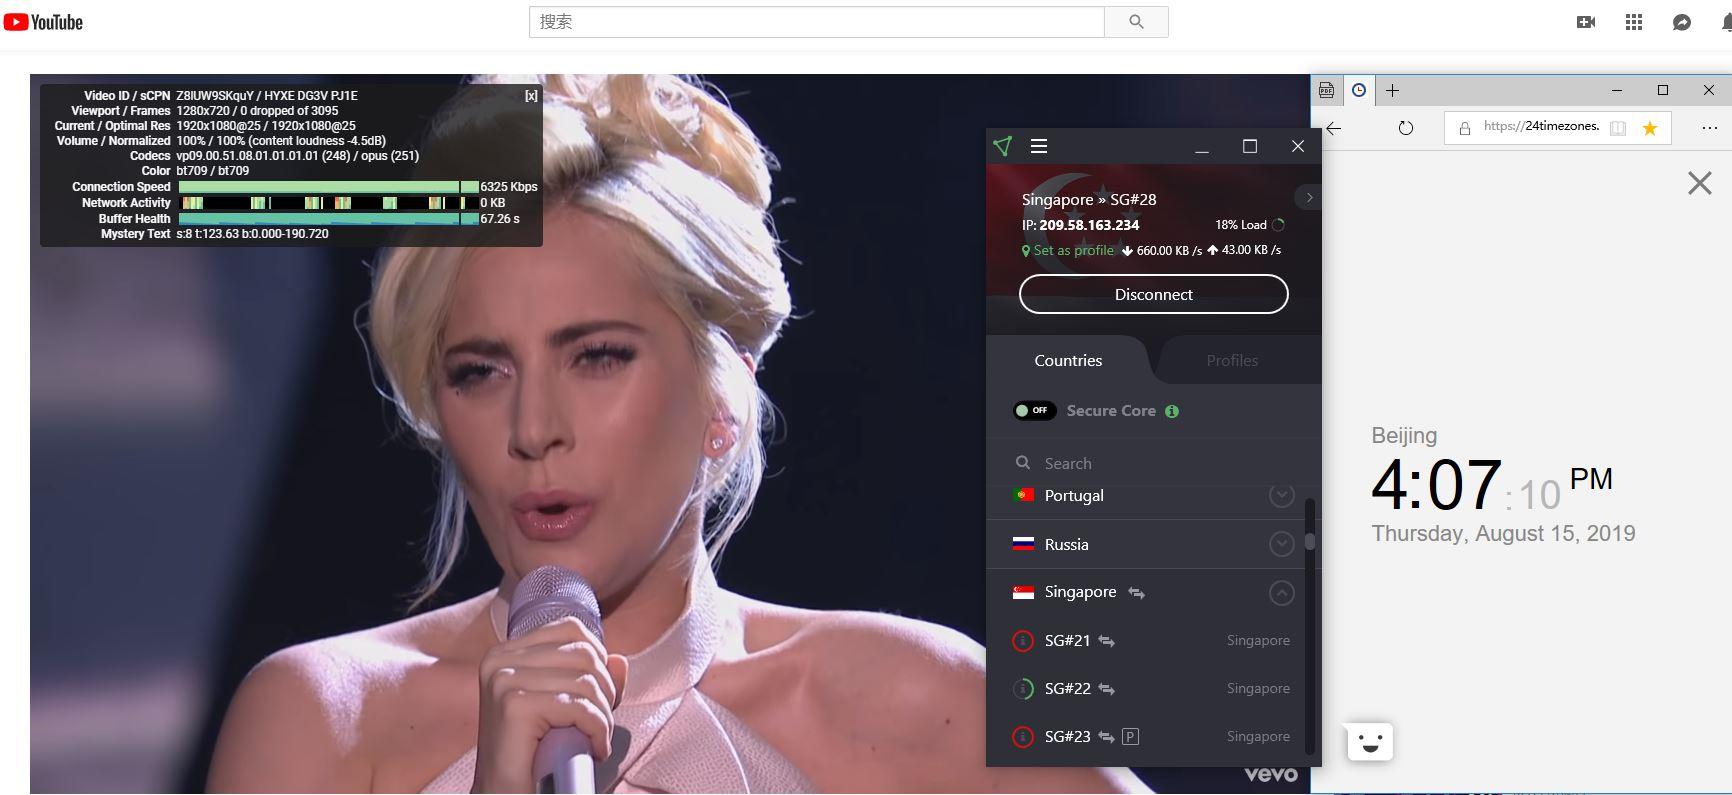 protonvpn windows 新加坡服务器28 中国翻墙 科学上网 YouTube速度测试-20190815